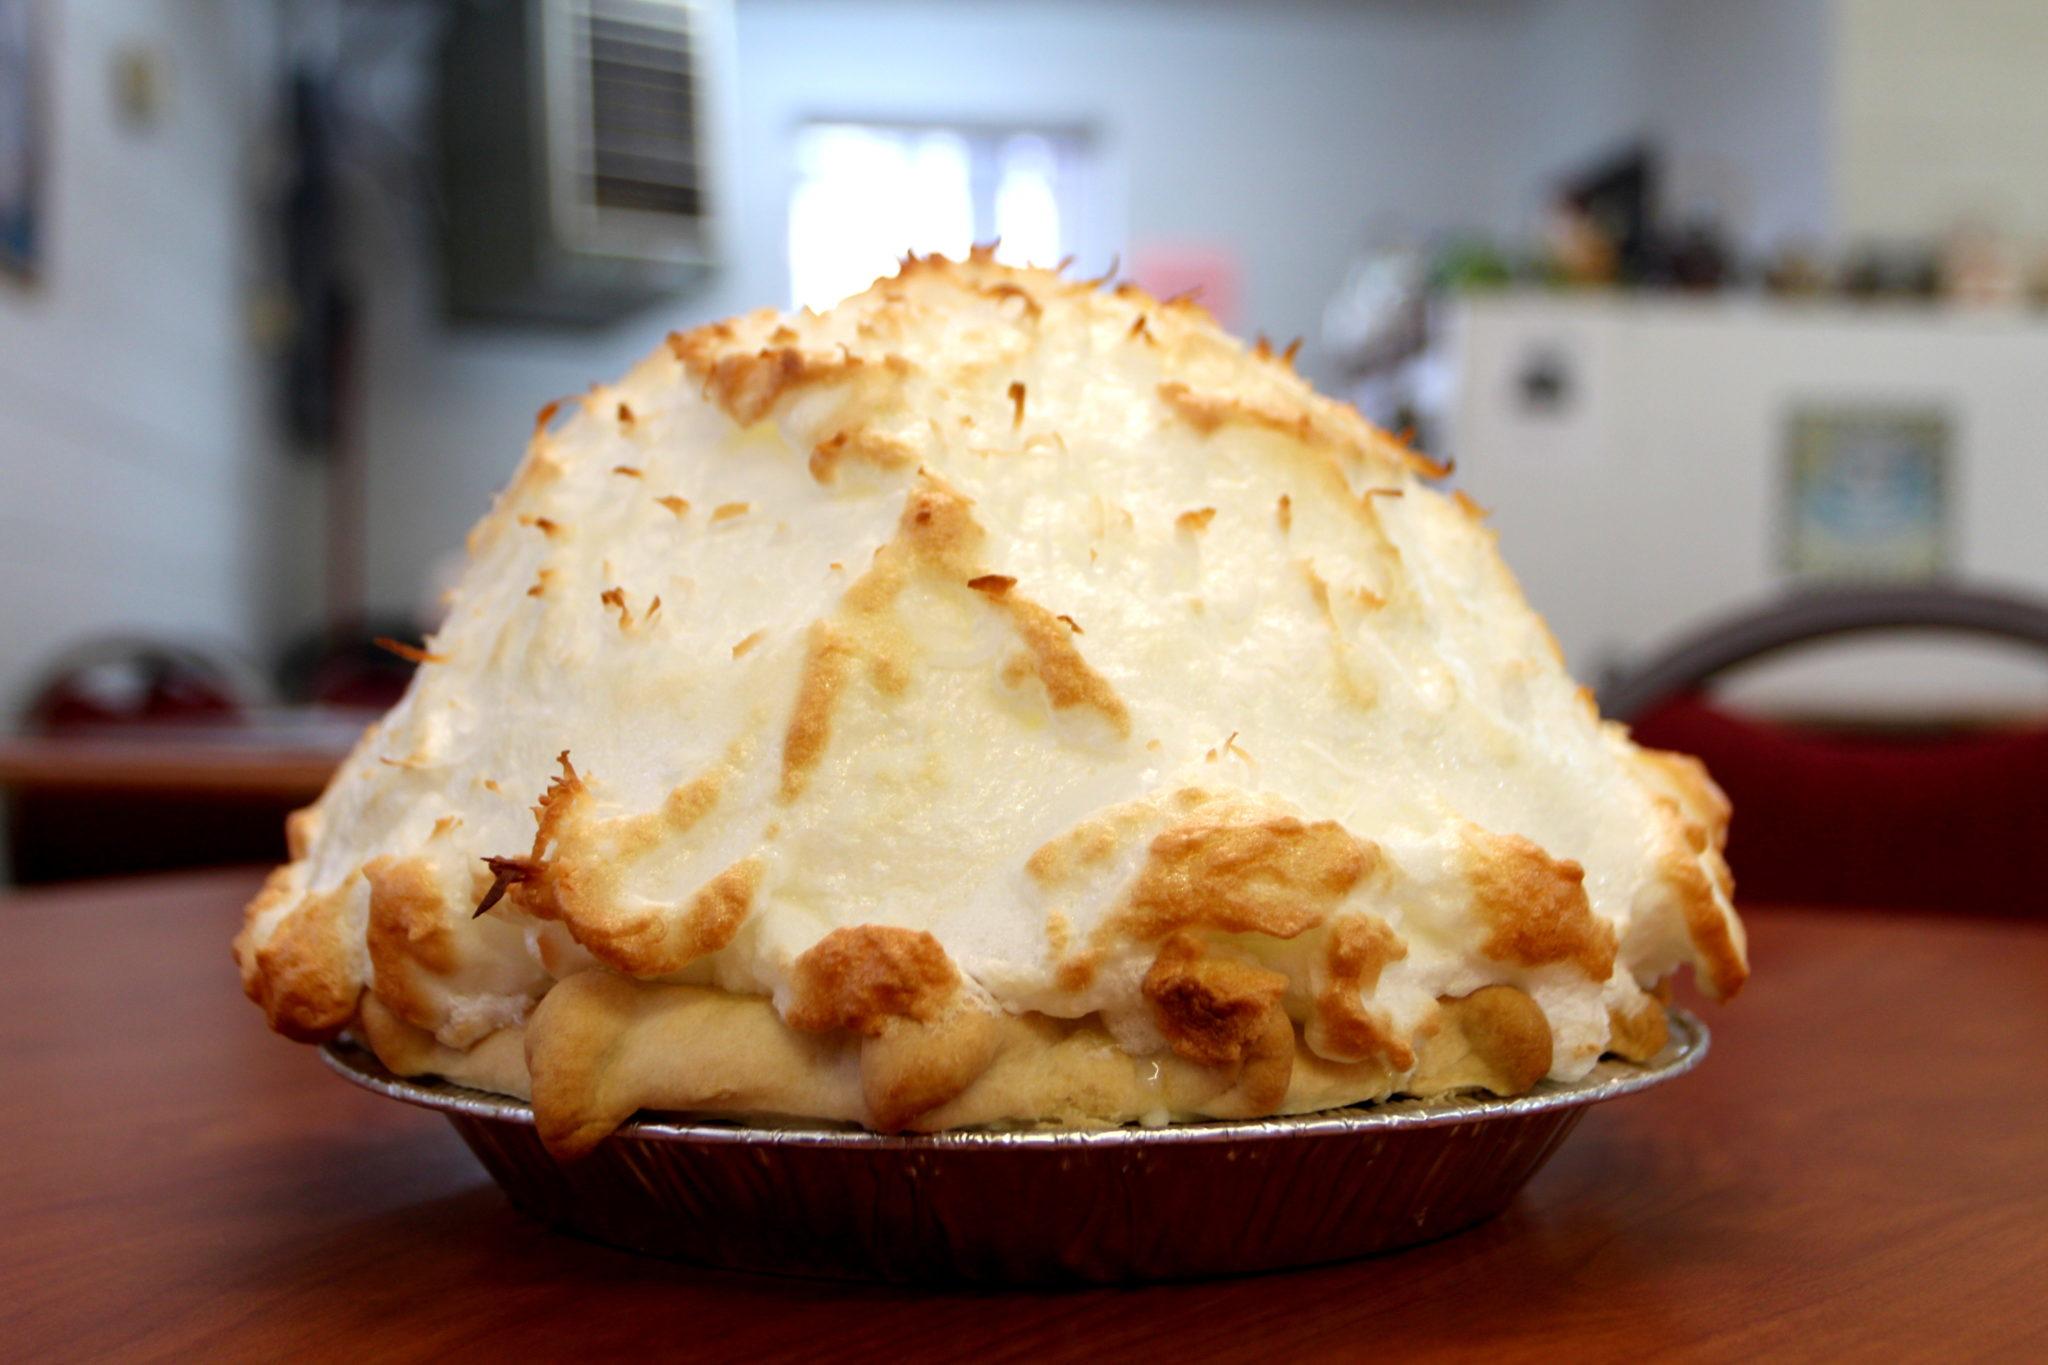 lamar-sweet-treats-coconut-meringue-pie-by-kat-robinson.jpg